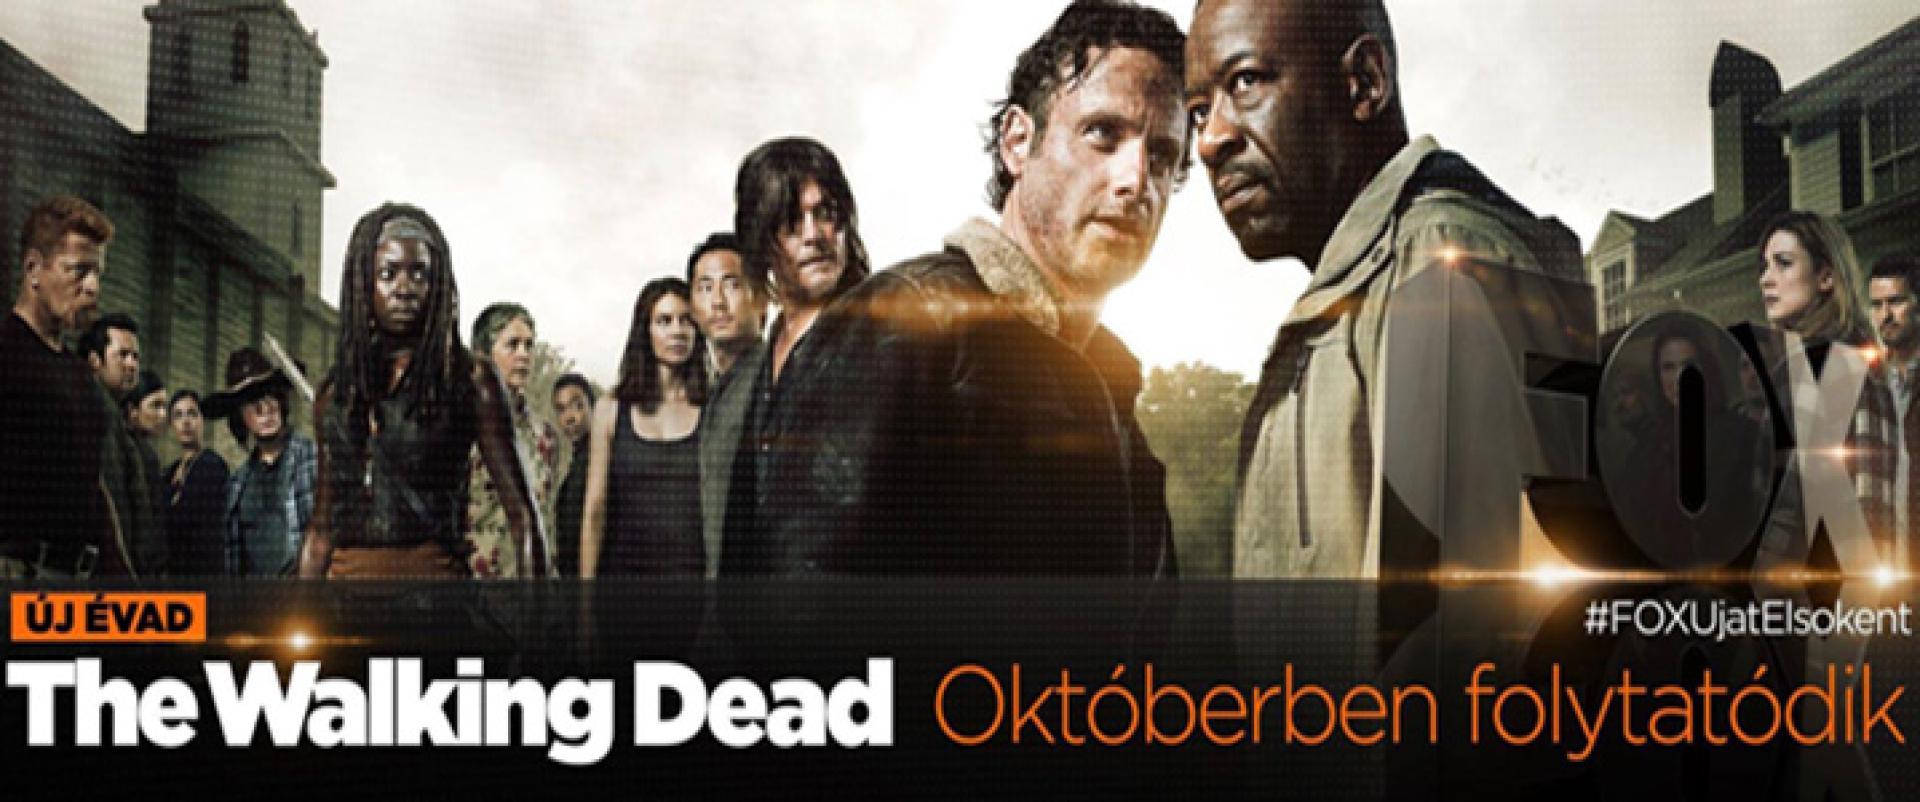 The Walking Dead, 6. évad: spoileres infó